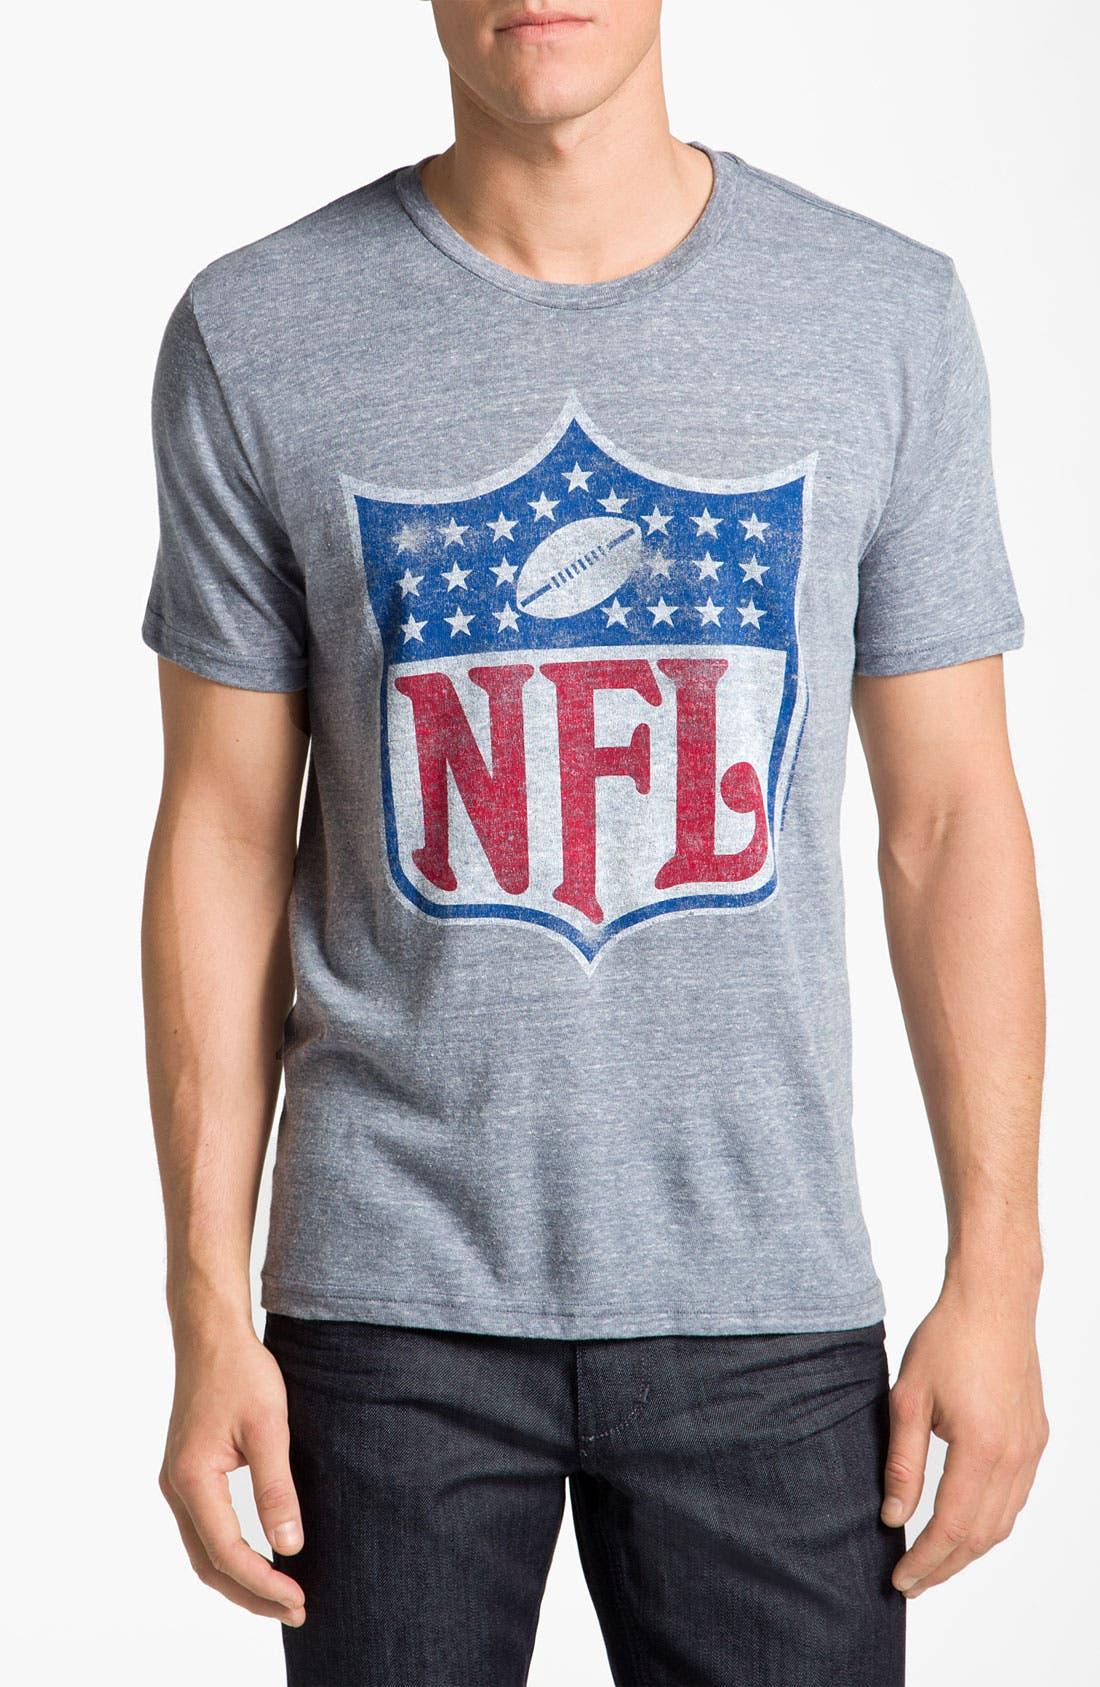 Alternate Image 1 Selected - Junk Food NFL Shield Graphic Crewneck T-Shirt